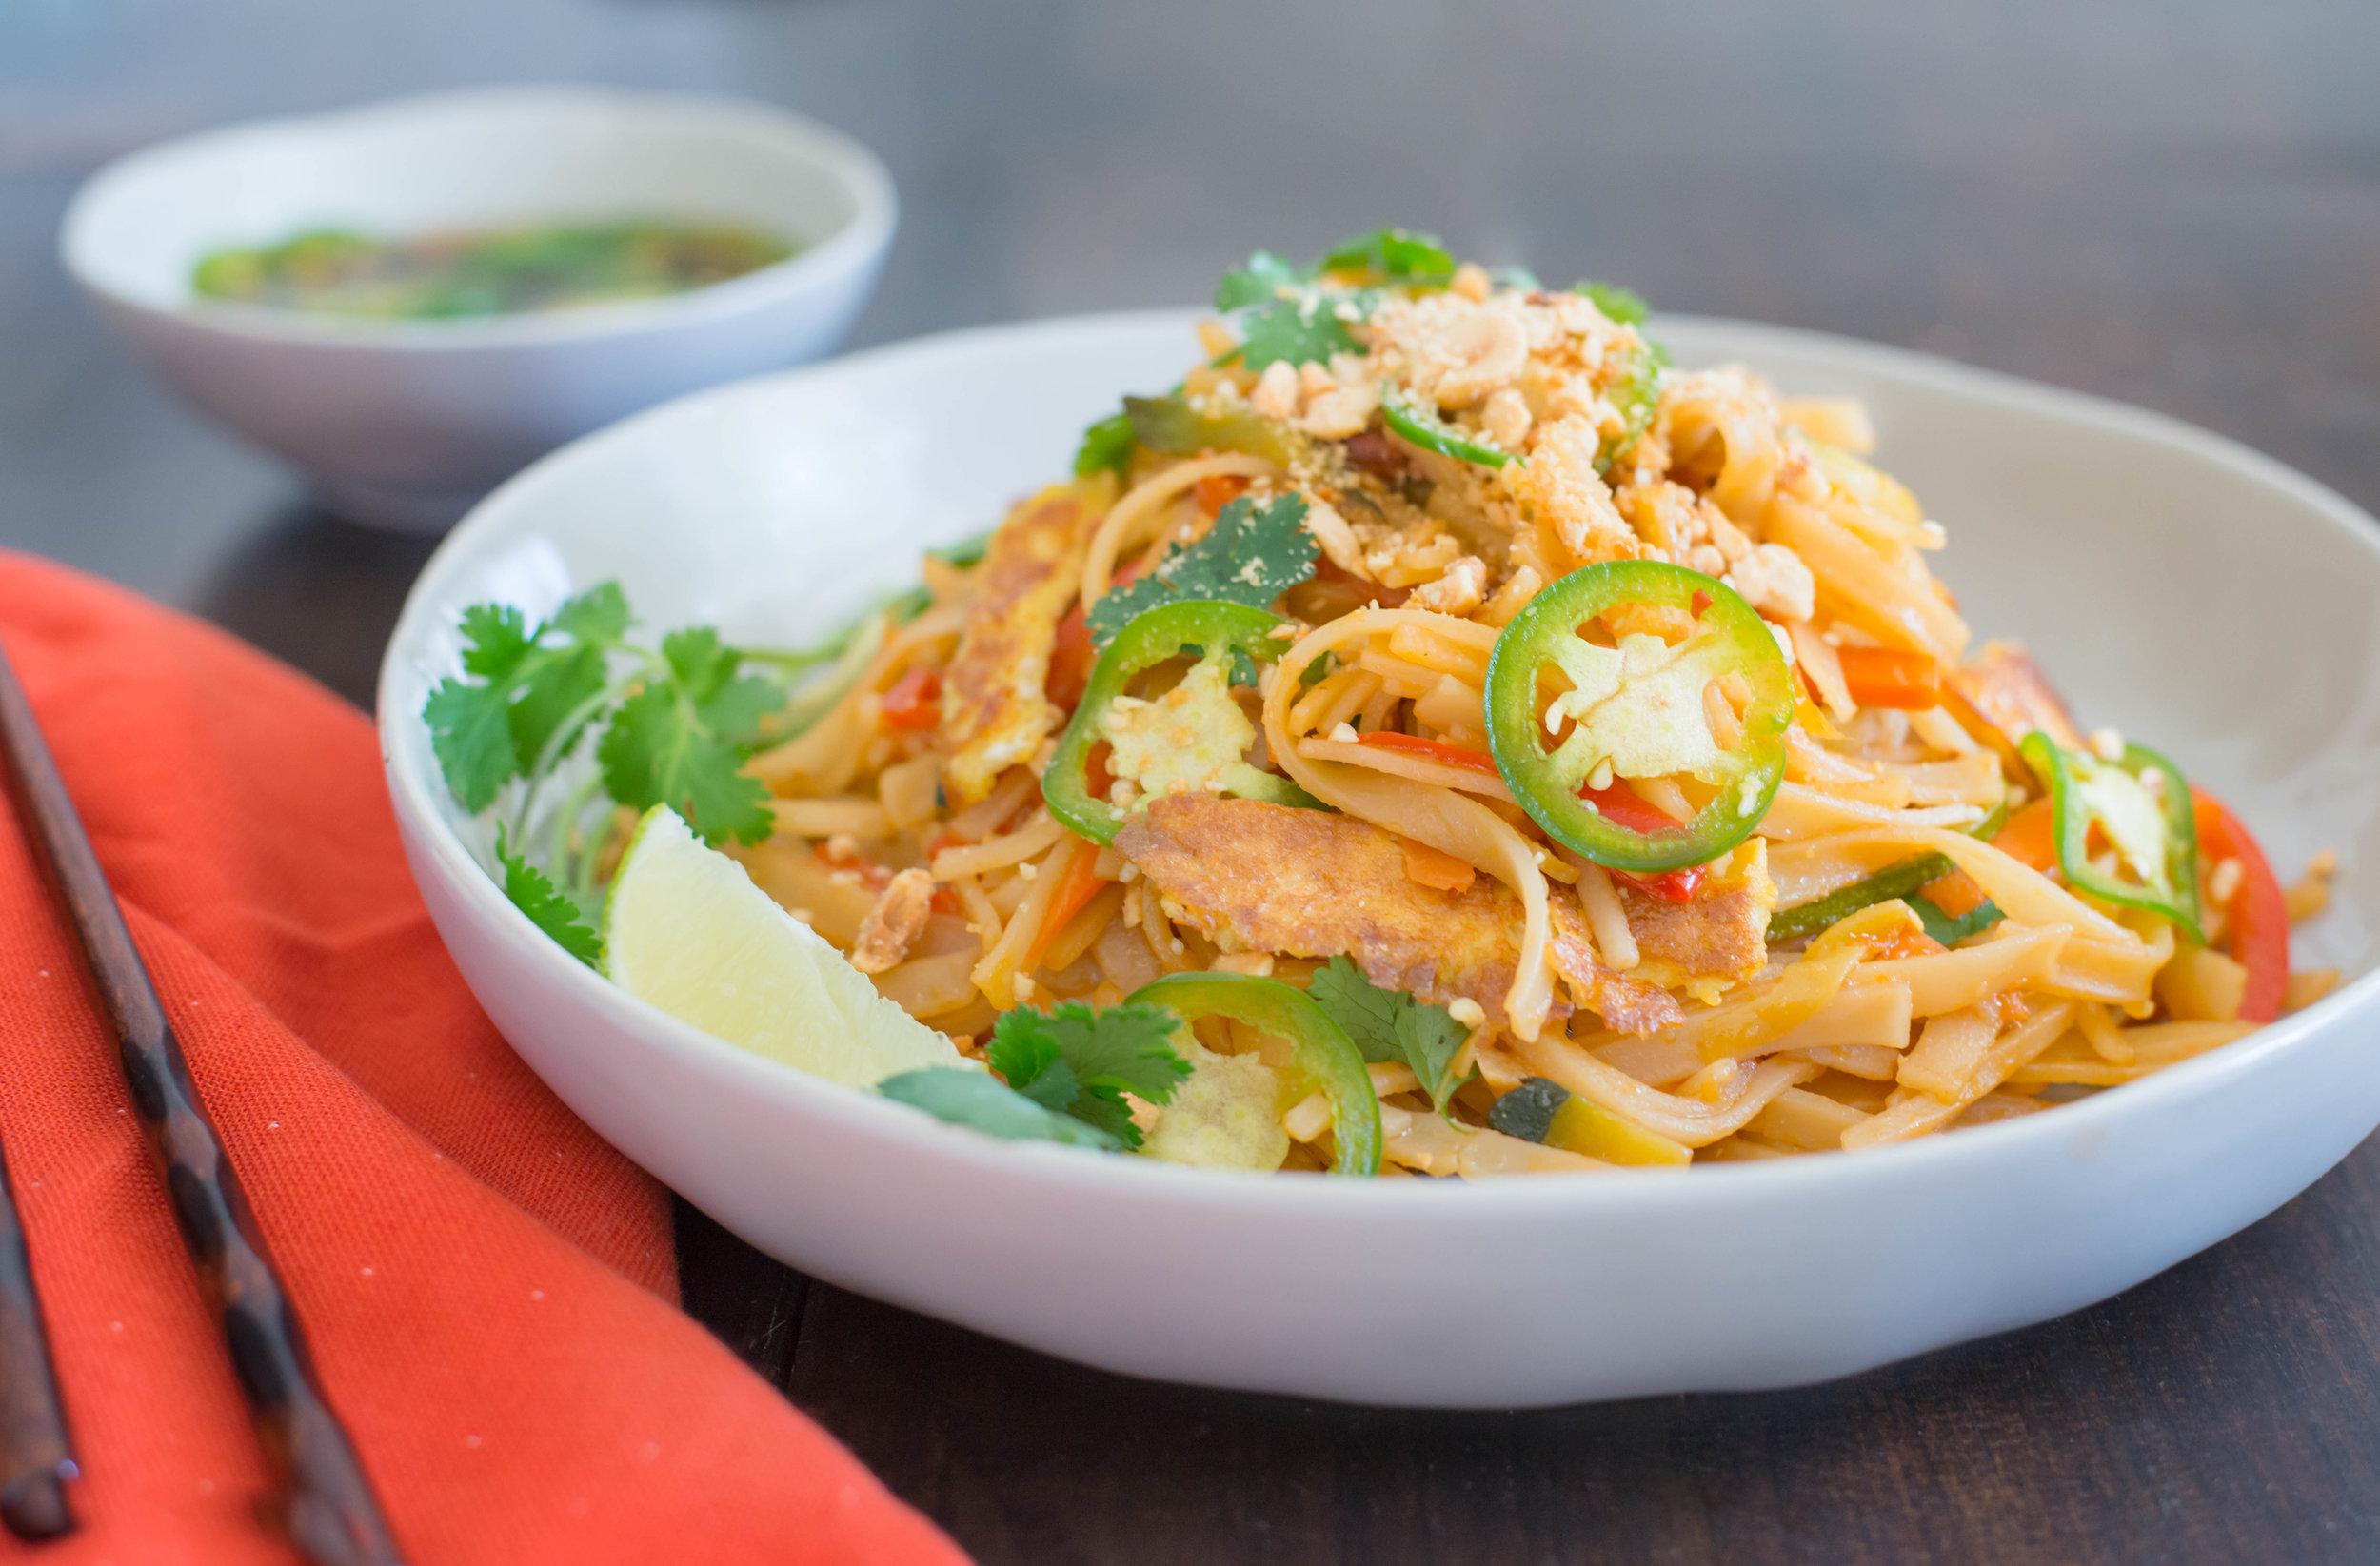 Mixed And Measured | Vegetarian Food Blog by Riley Yahr | Vegetarian Pad Thai